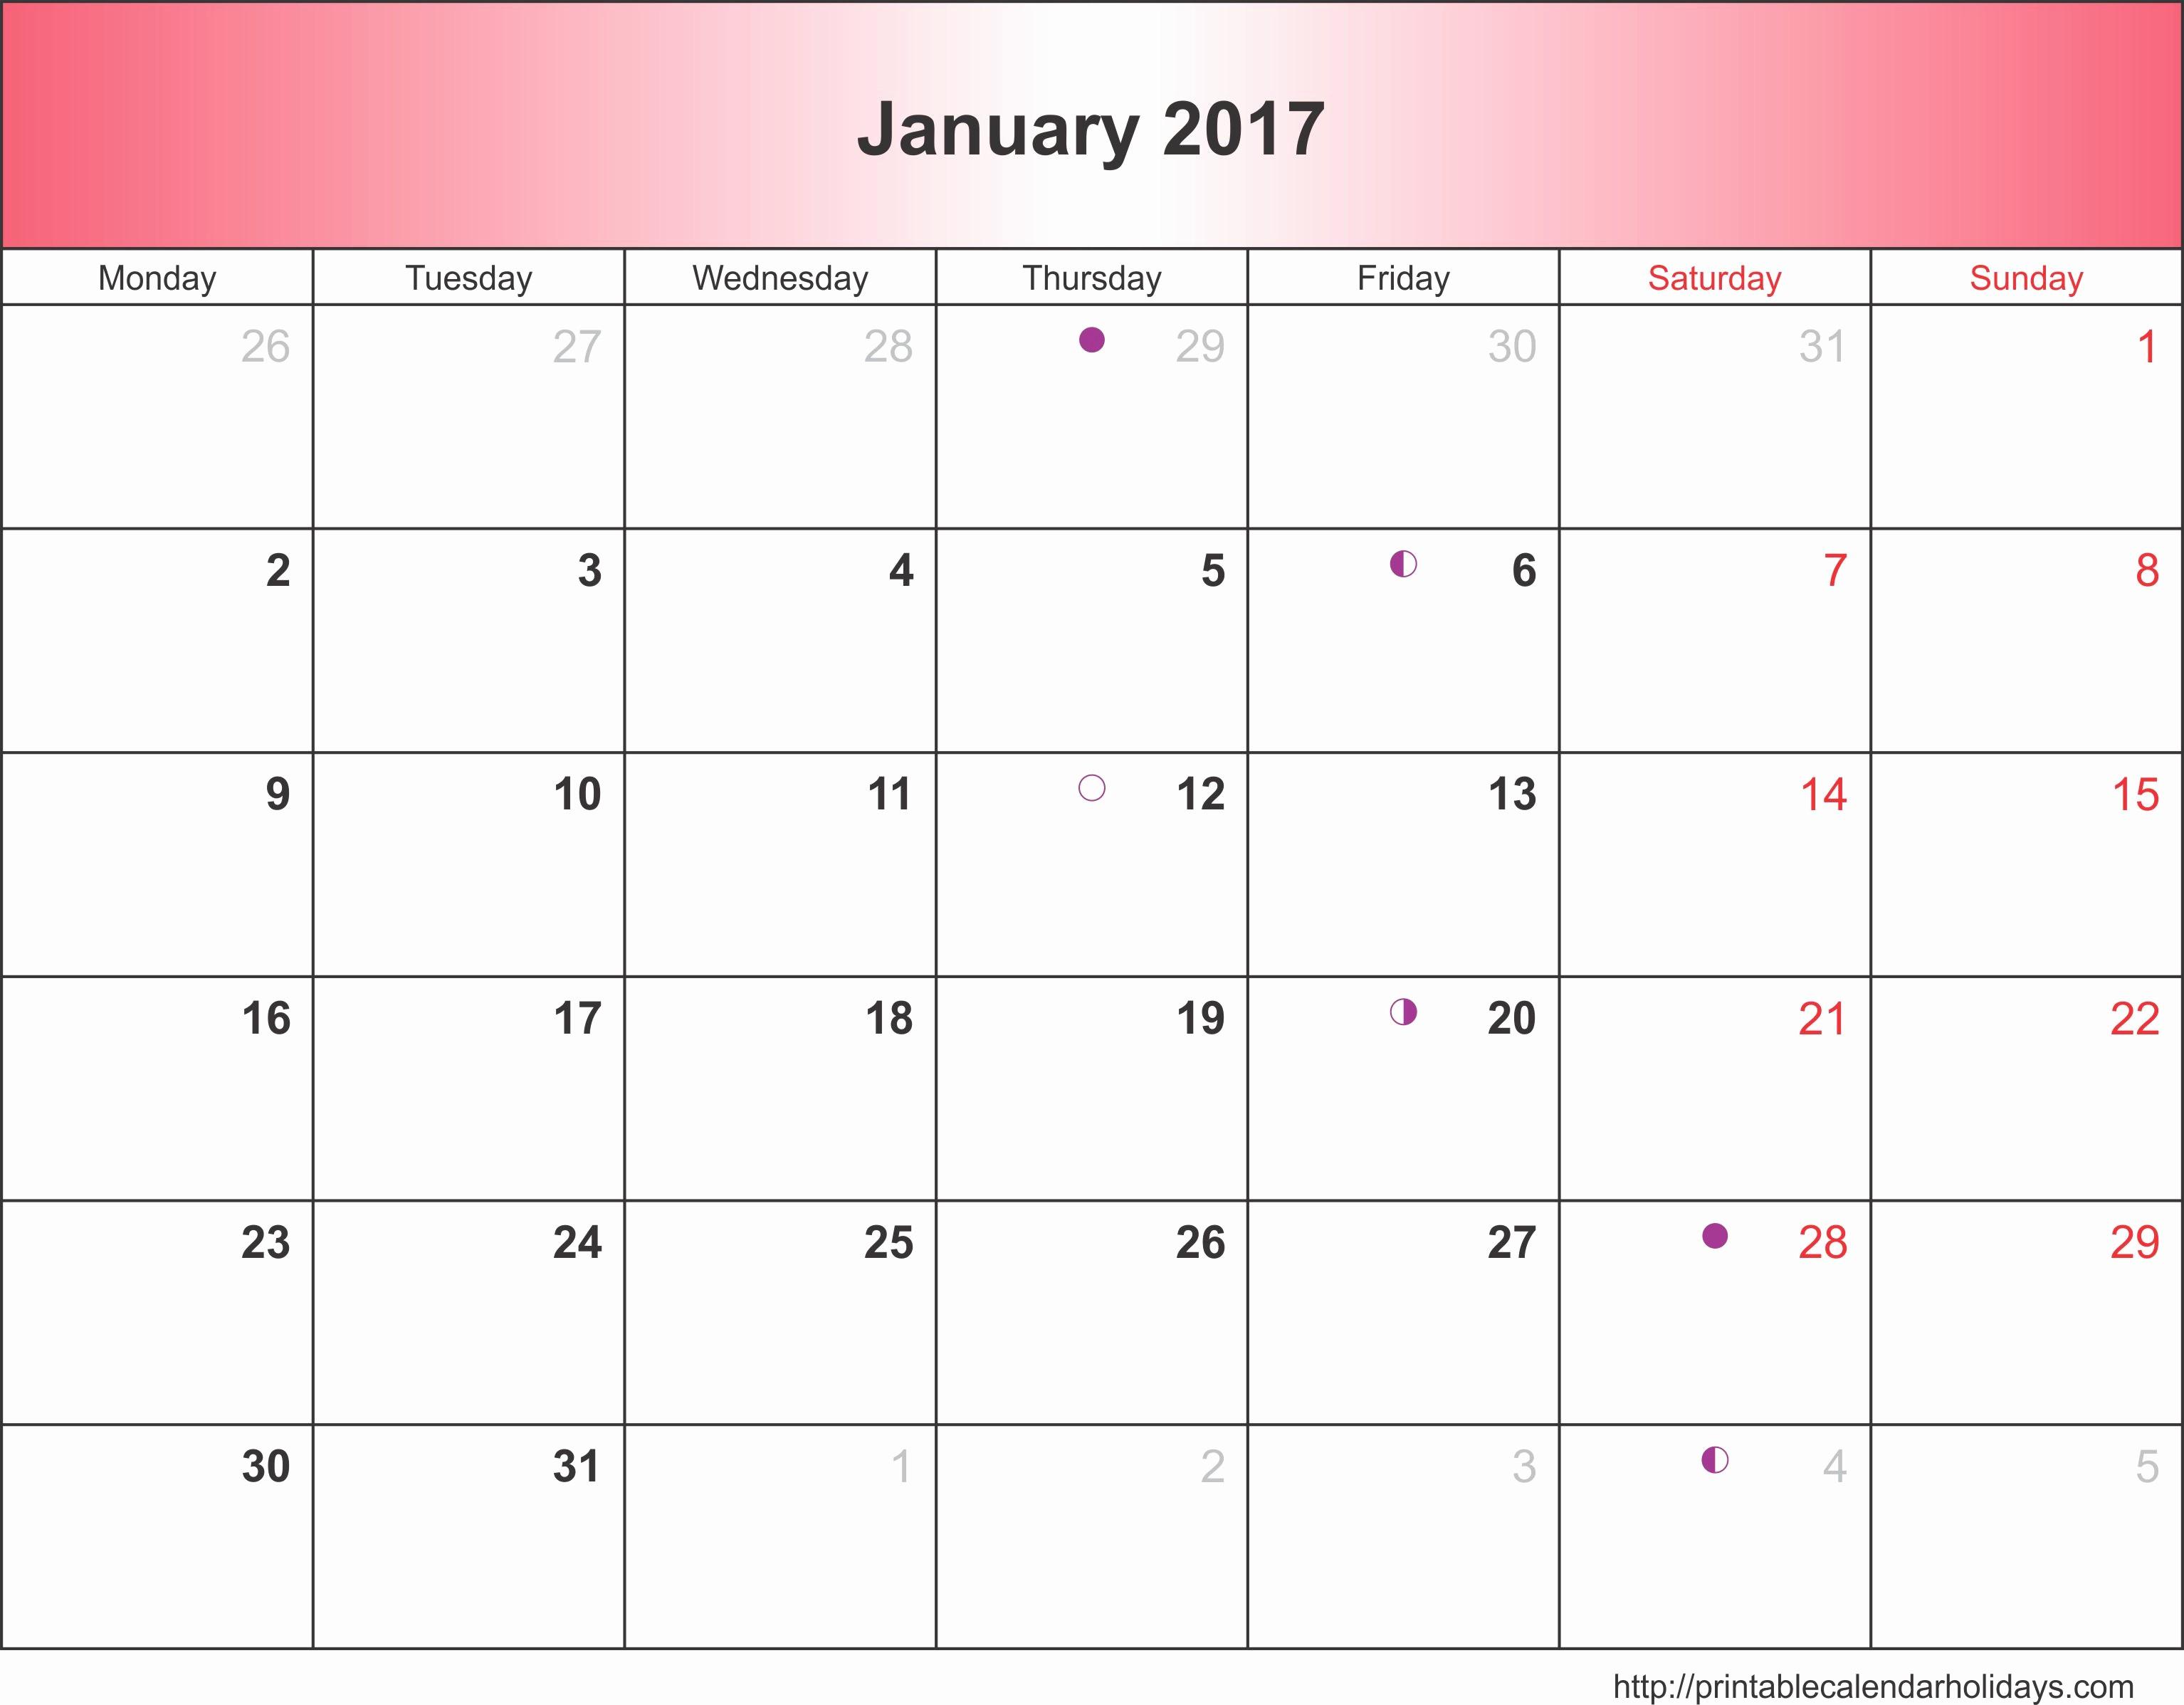 Free Printable Quarterly Calendar 2017 New Monthly Calendar 2017 Archives Free Printable Calendar